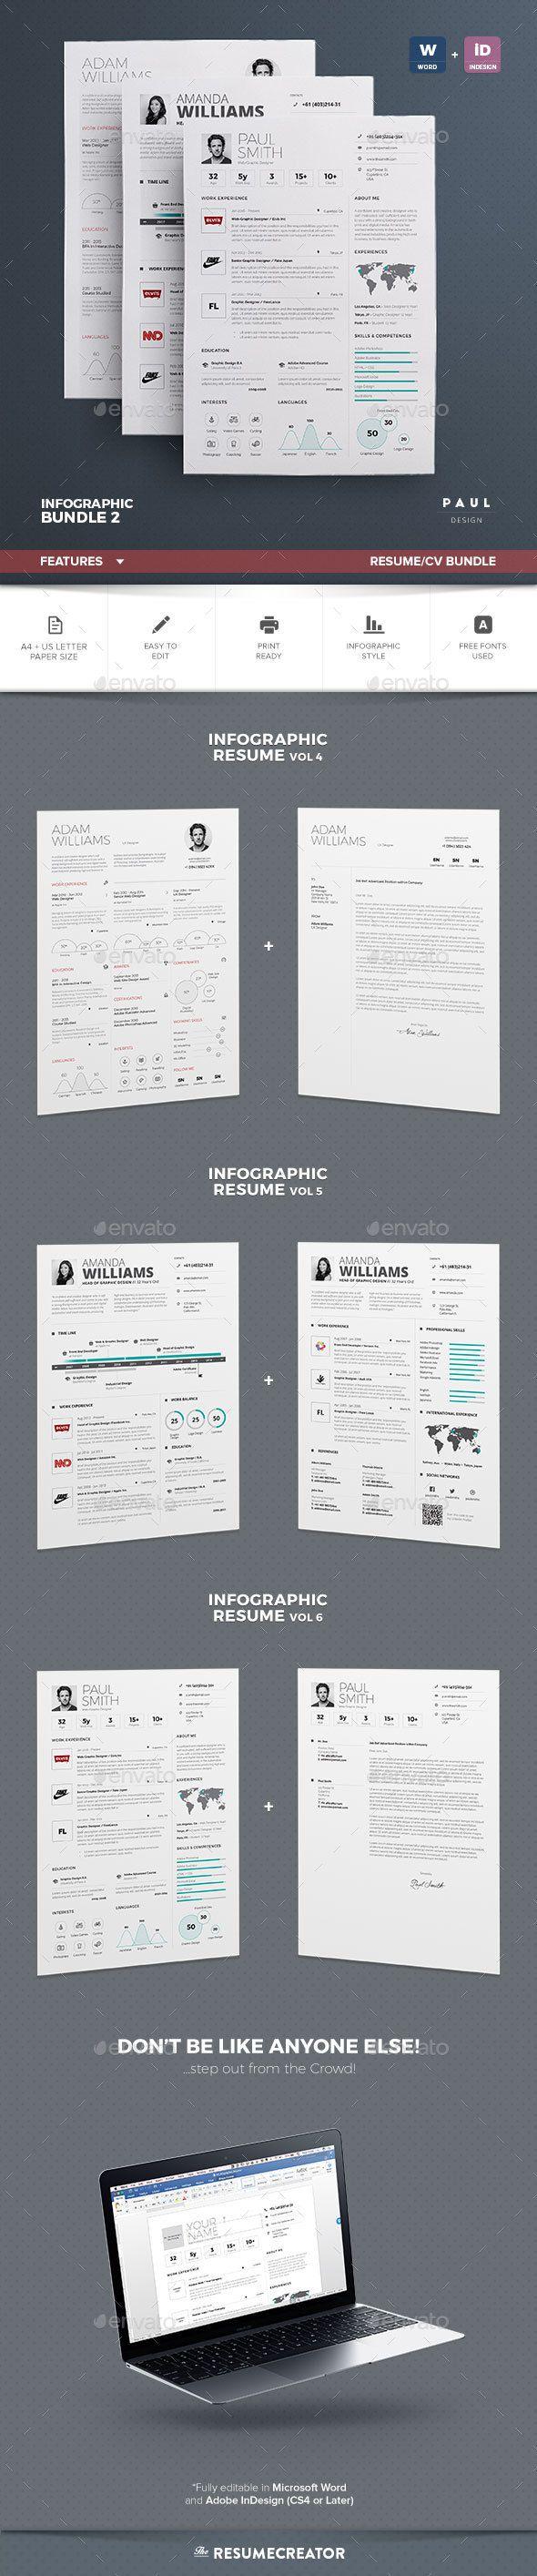 Infographic Resume Cv Bundle Download Https Graphicriver Net Item Infographic Resumecv Bundle Vol 2 18704680 Infografik Lebenslauf Lebenslauf Cv Lebenslauf